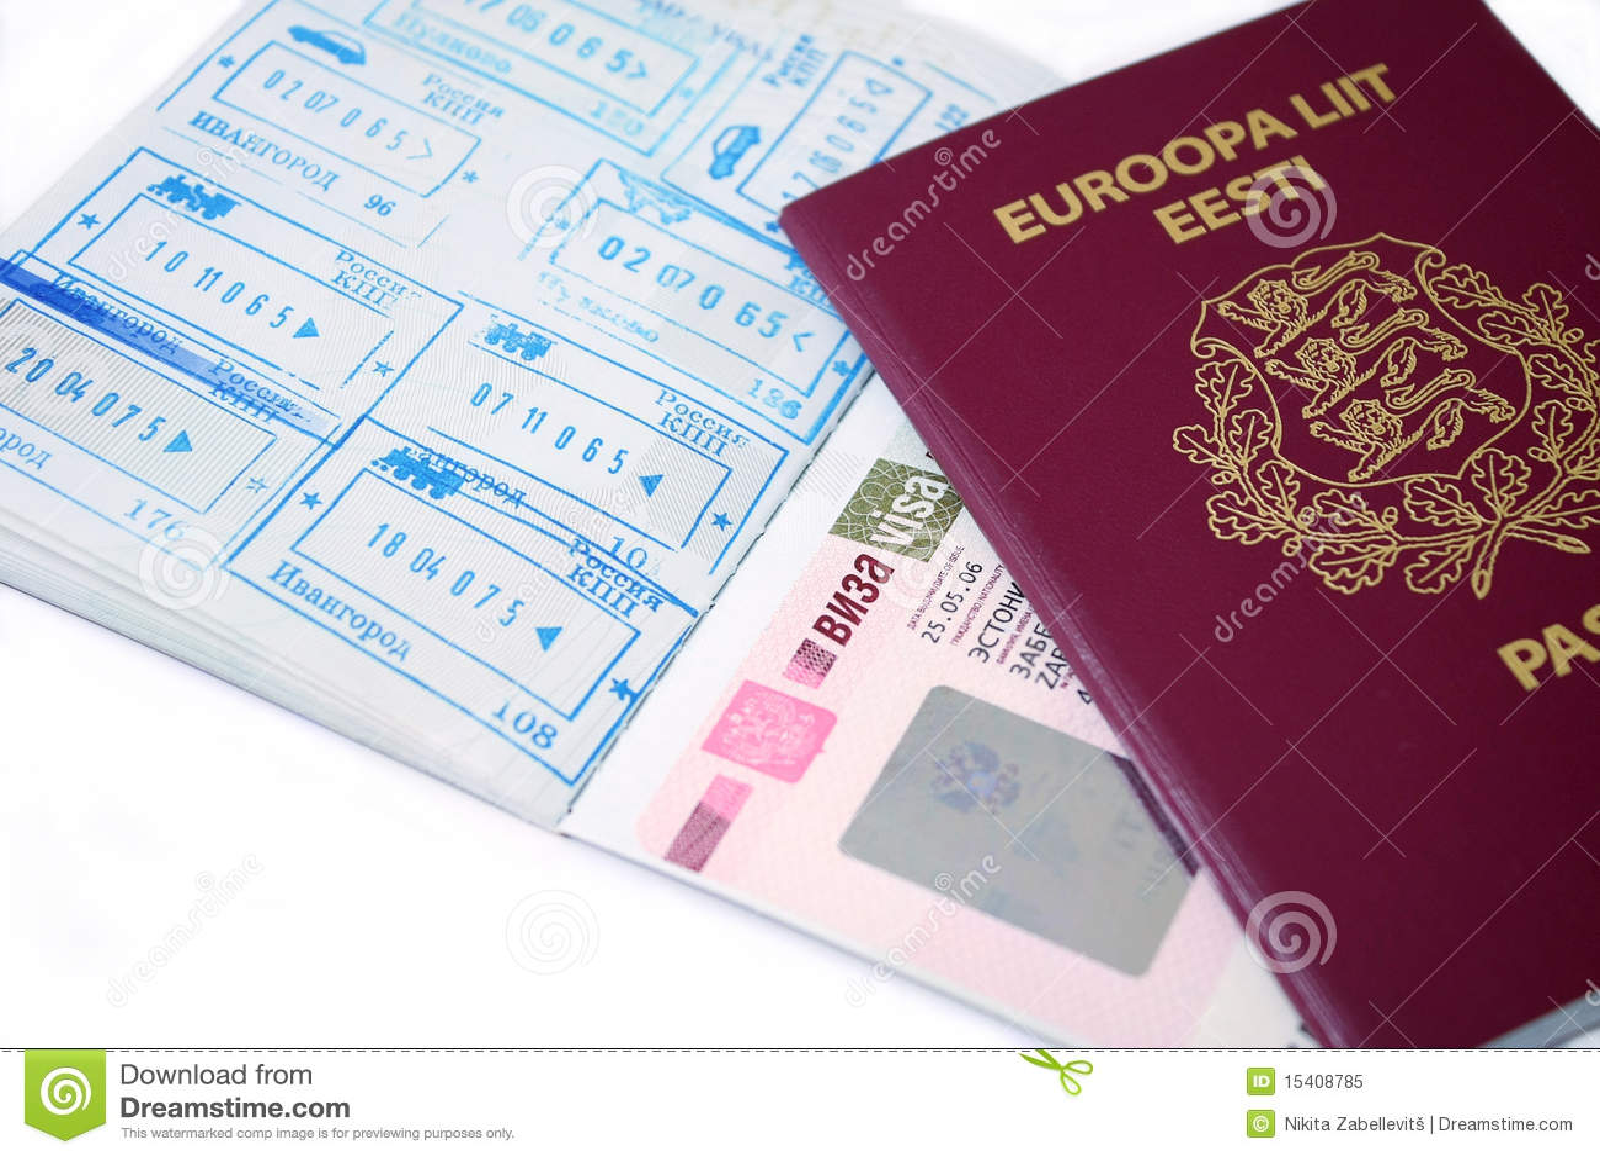 Tallinn Apartments Russian Visas Visa 105